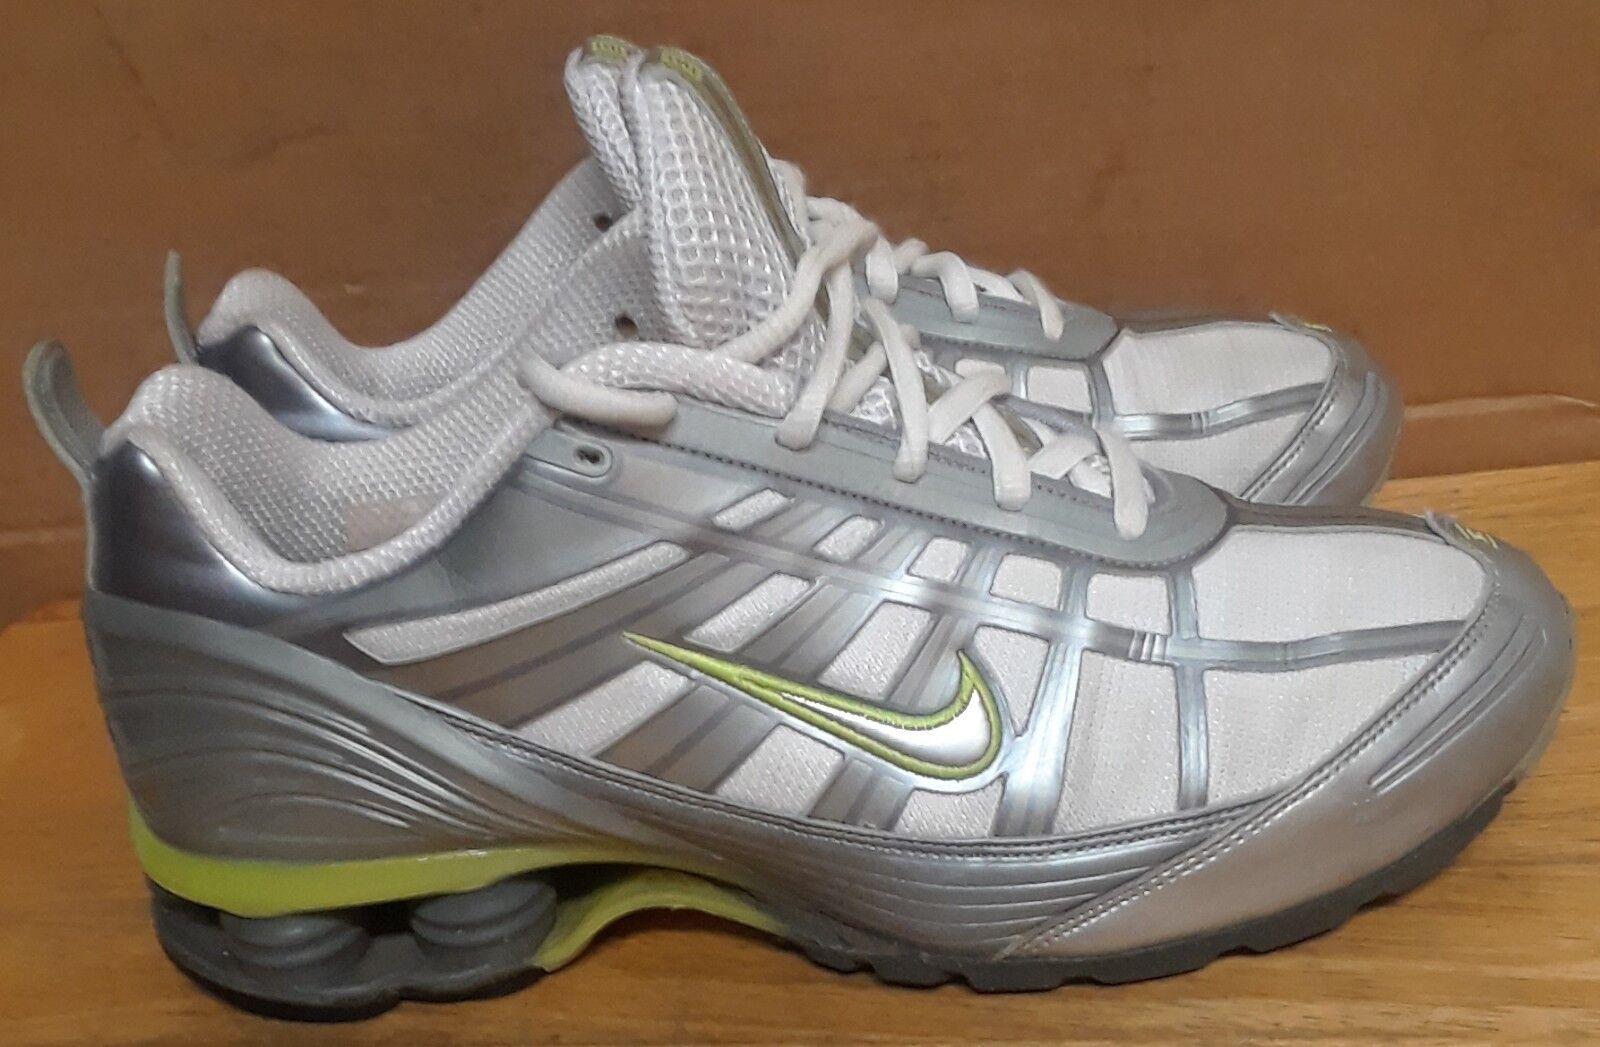 NIKE SHOX Tuned For Women 312522-101 women's athletic shoe size 8.5